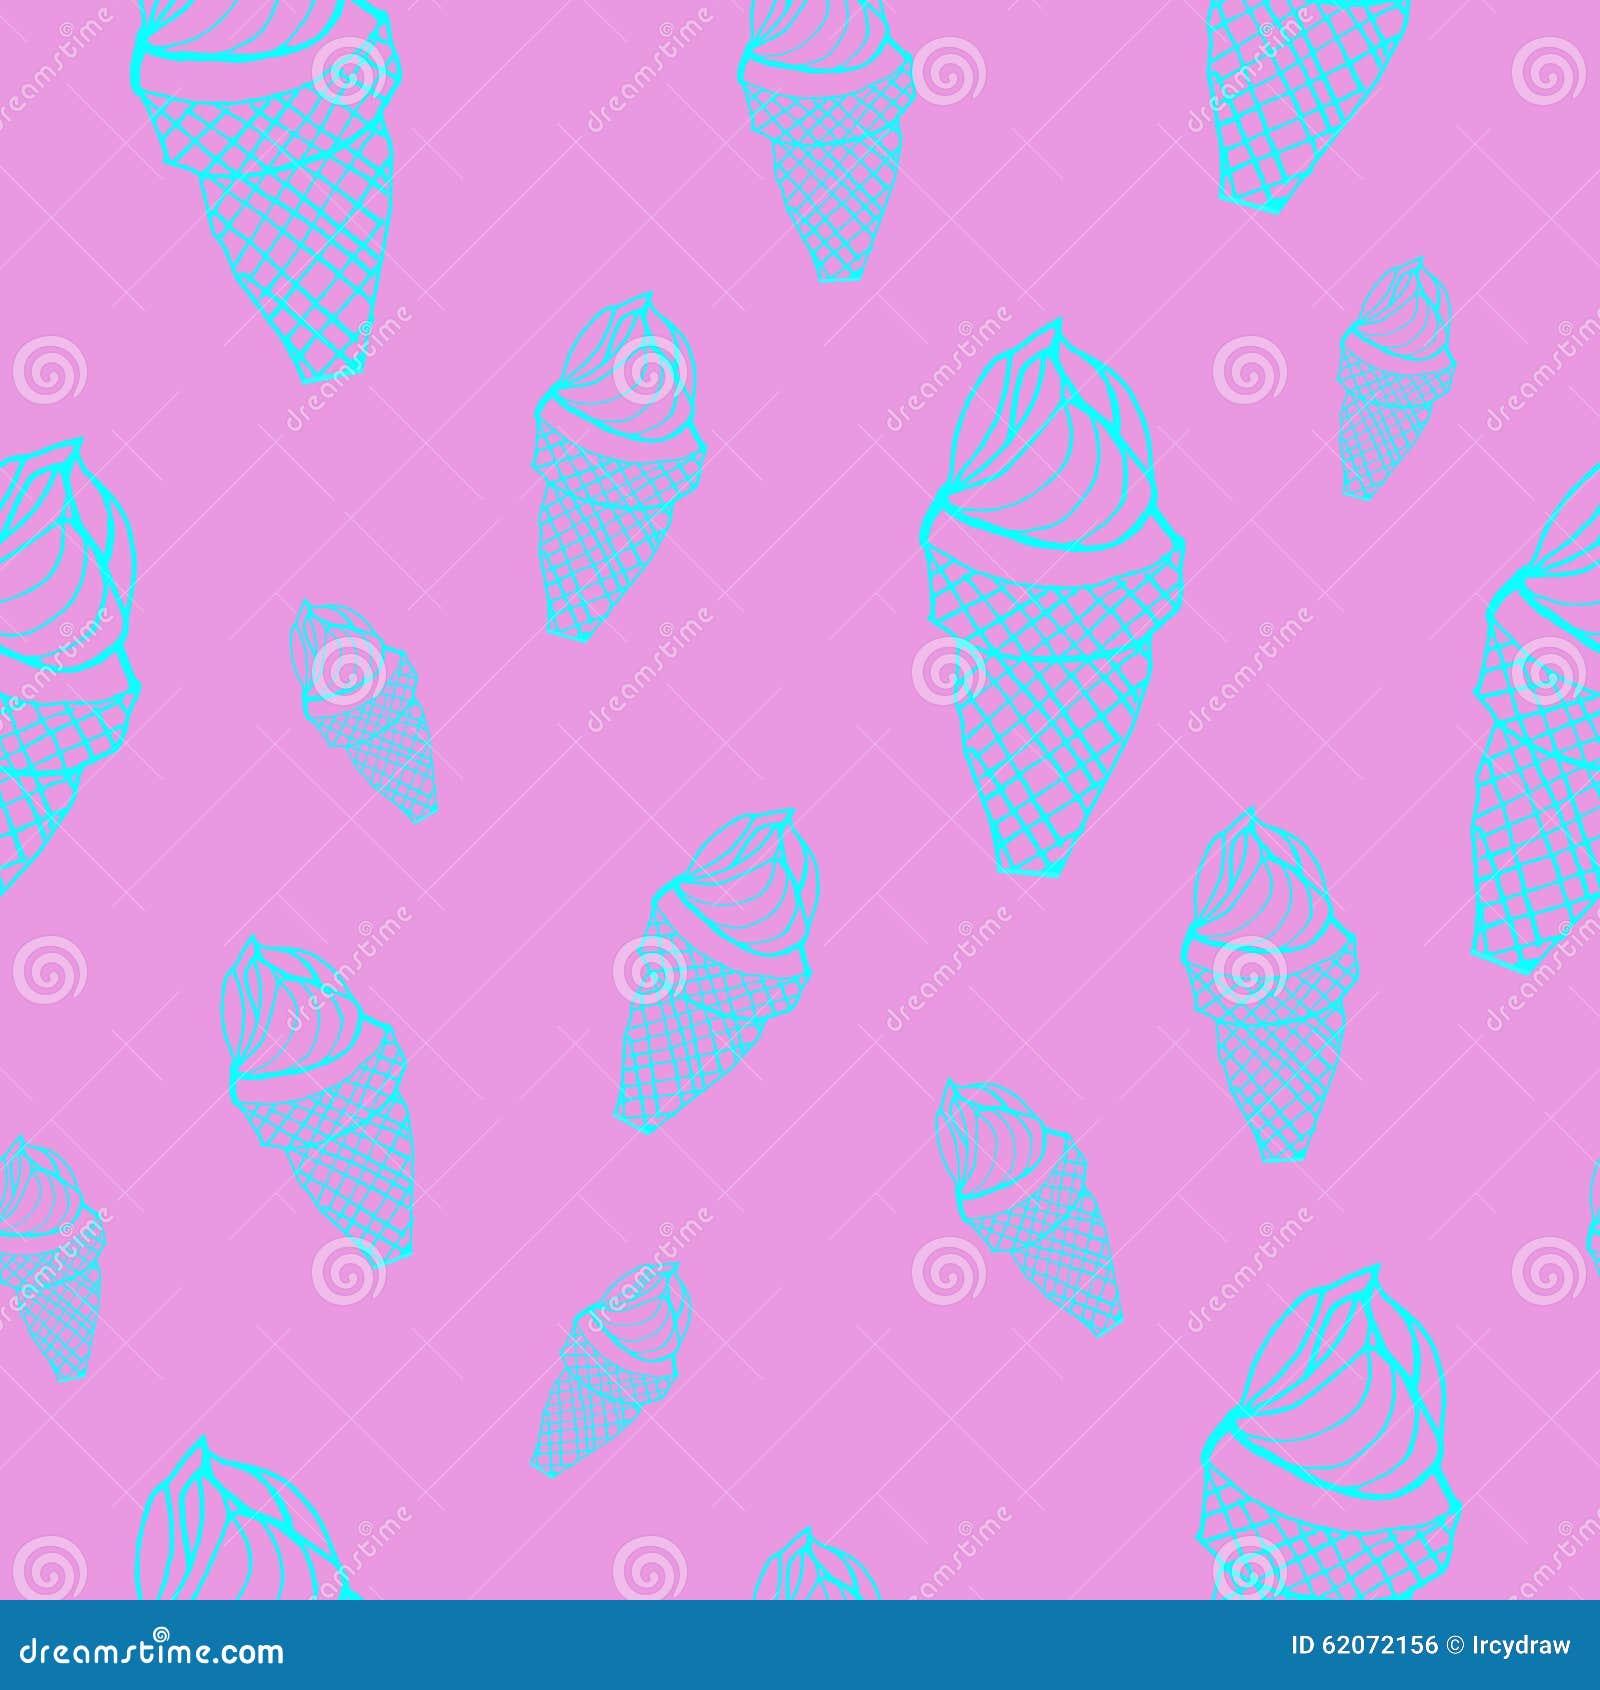 Seamless Ice Cream Background: Ice Cream Cones Seamless Vector Pattern Stock Vector